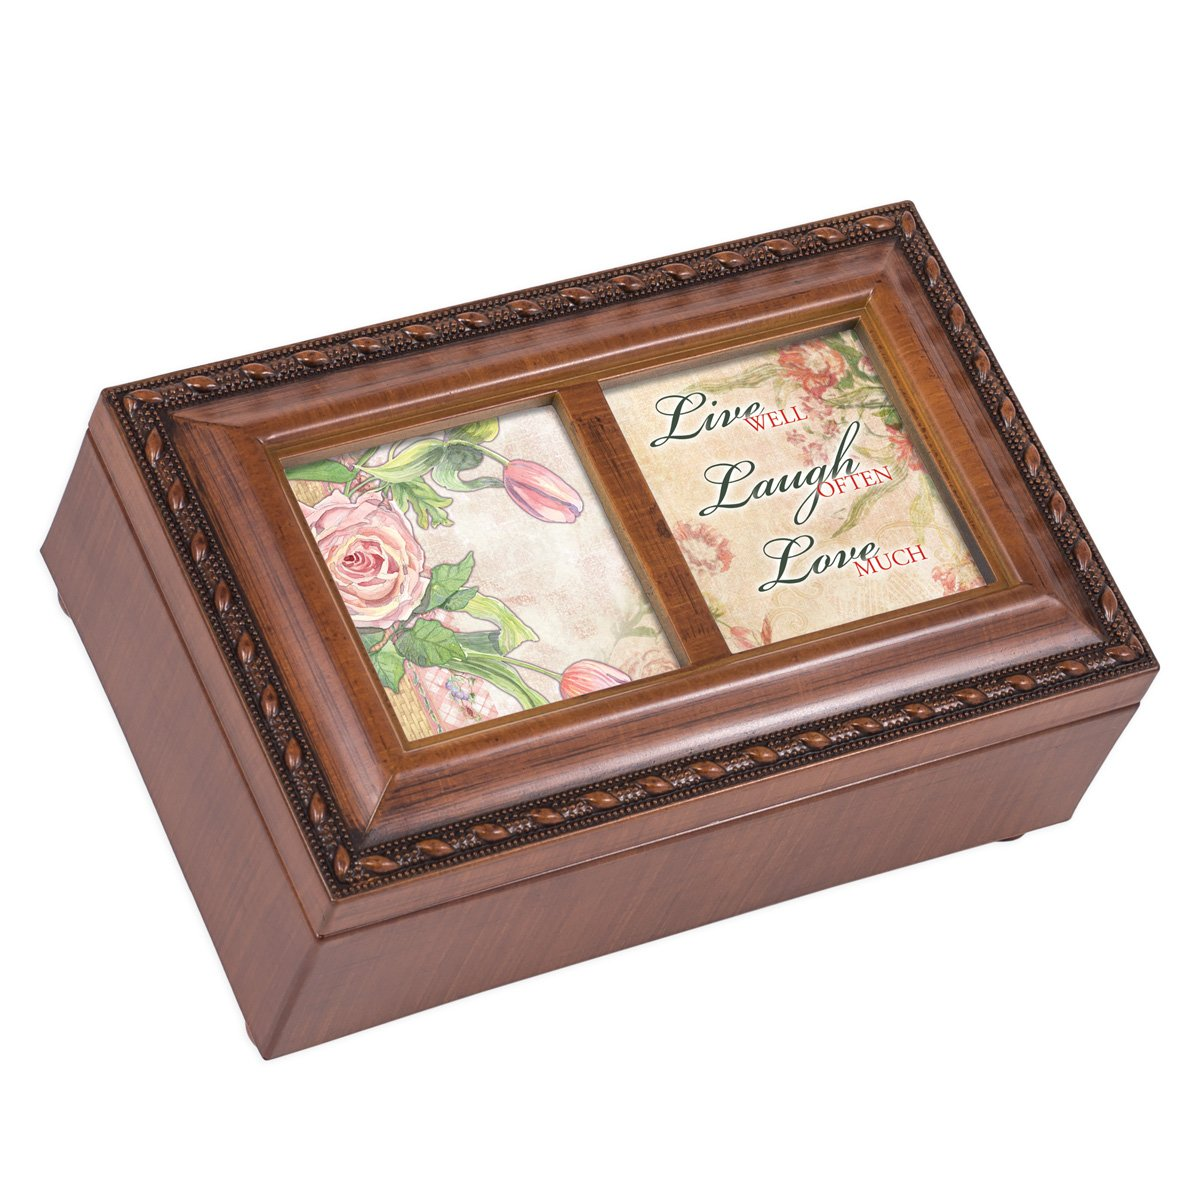 Cottage Garden Live Well Laugh Often Love Woodgrain Rope Trim Jewelry Music Box Plays Wonderful World